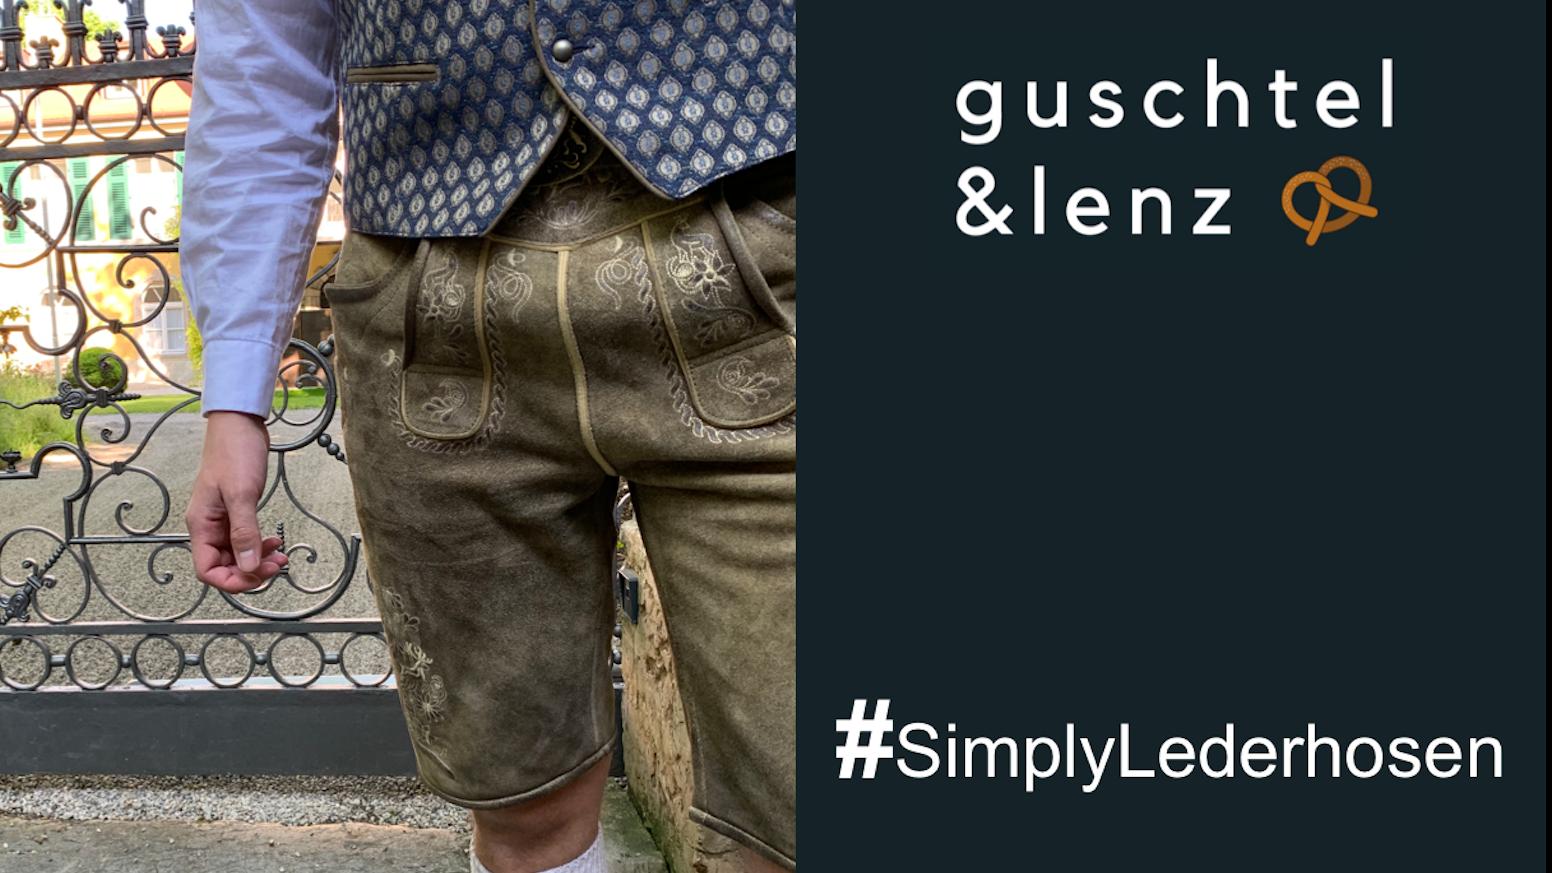 "The German ""Lederhose"" rethought: Contemporary design, quality, simplicity and a fair price."